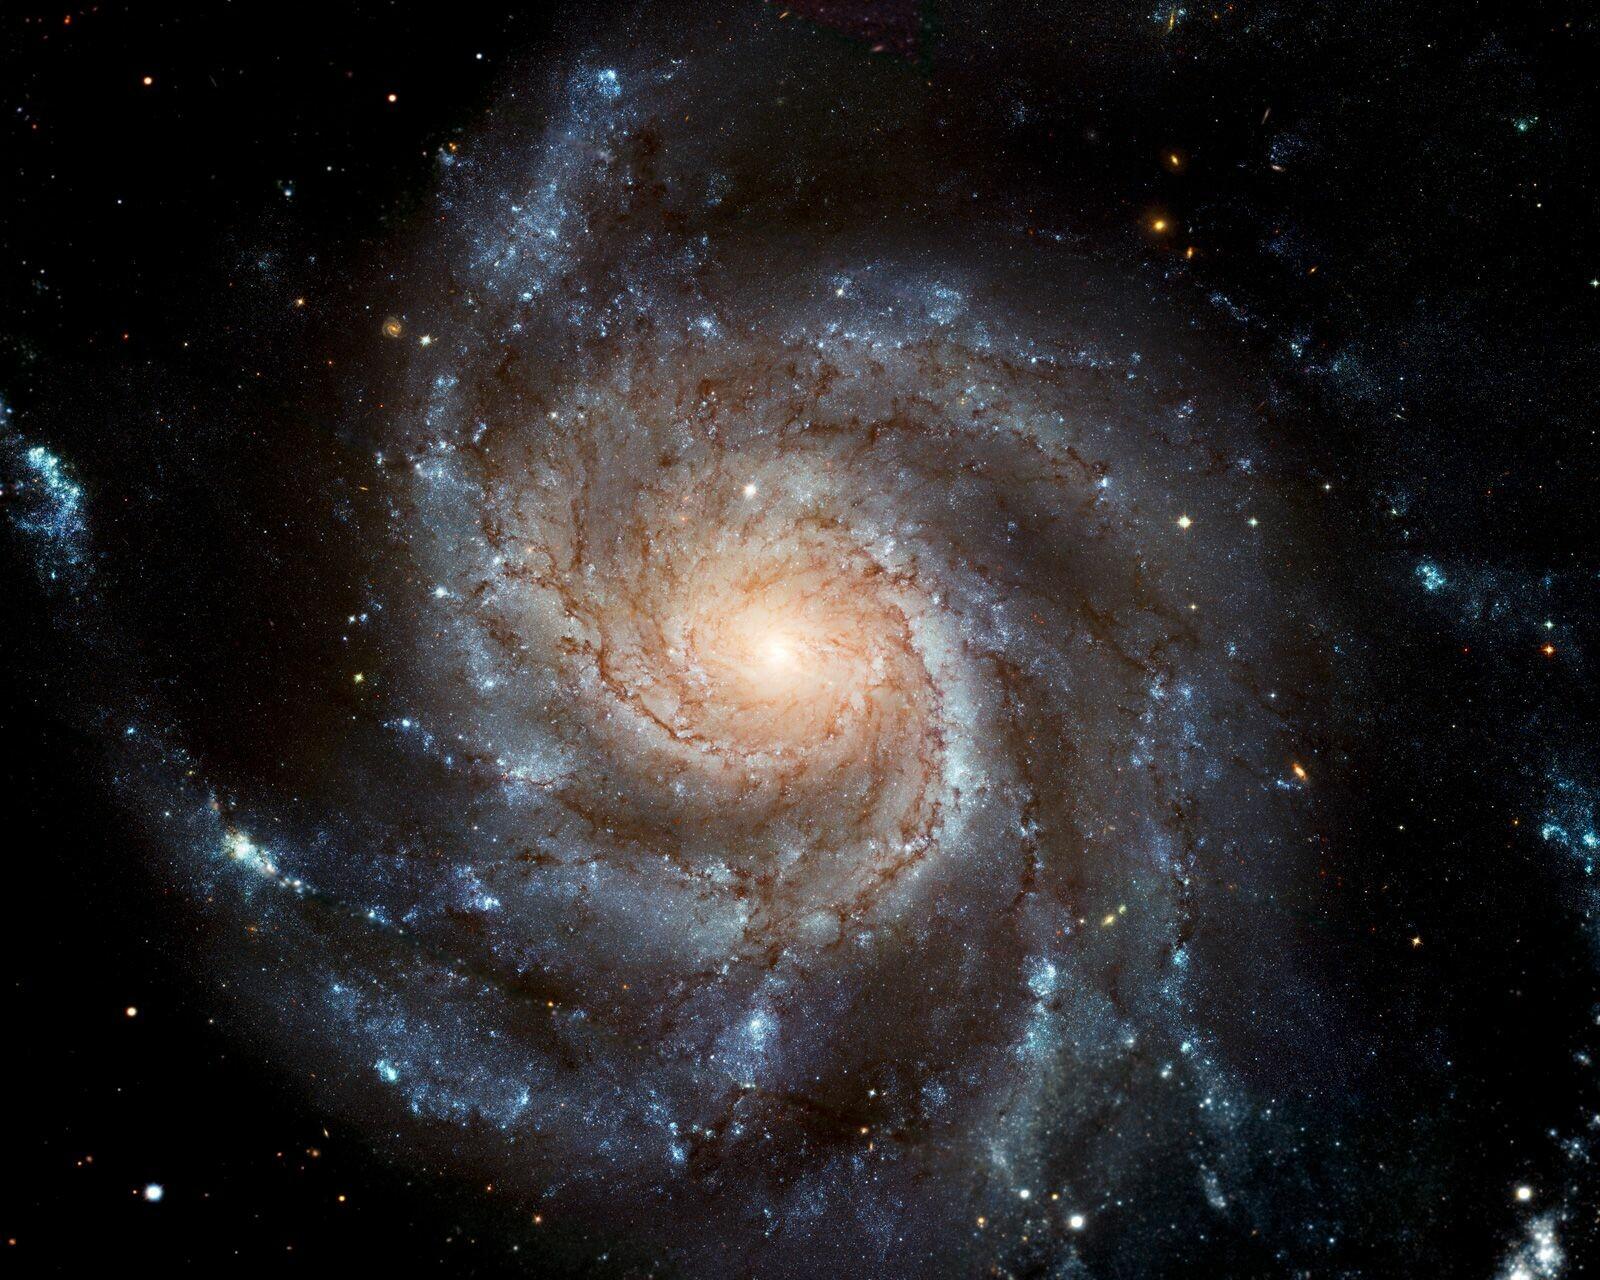 Pinwheel galaxy (NASA/ JPL - Caltech) - Hubble Telescope